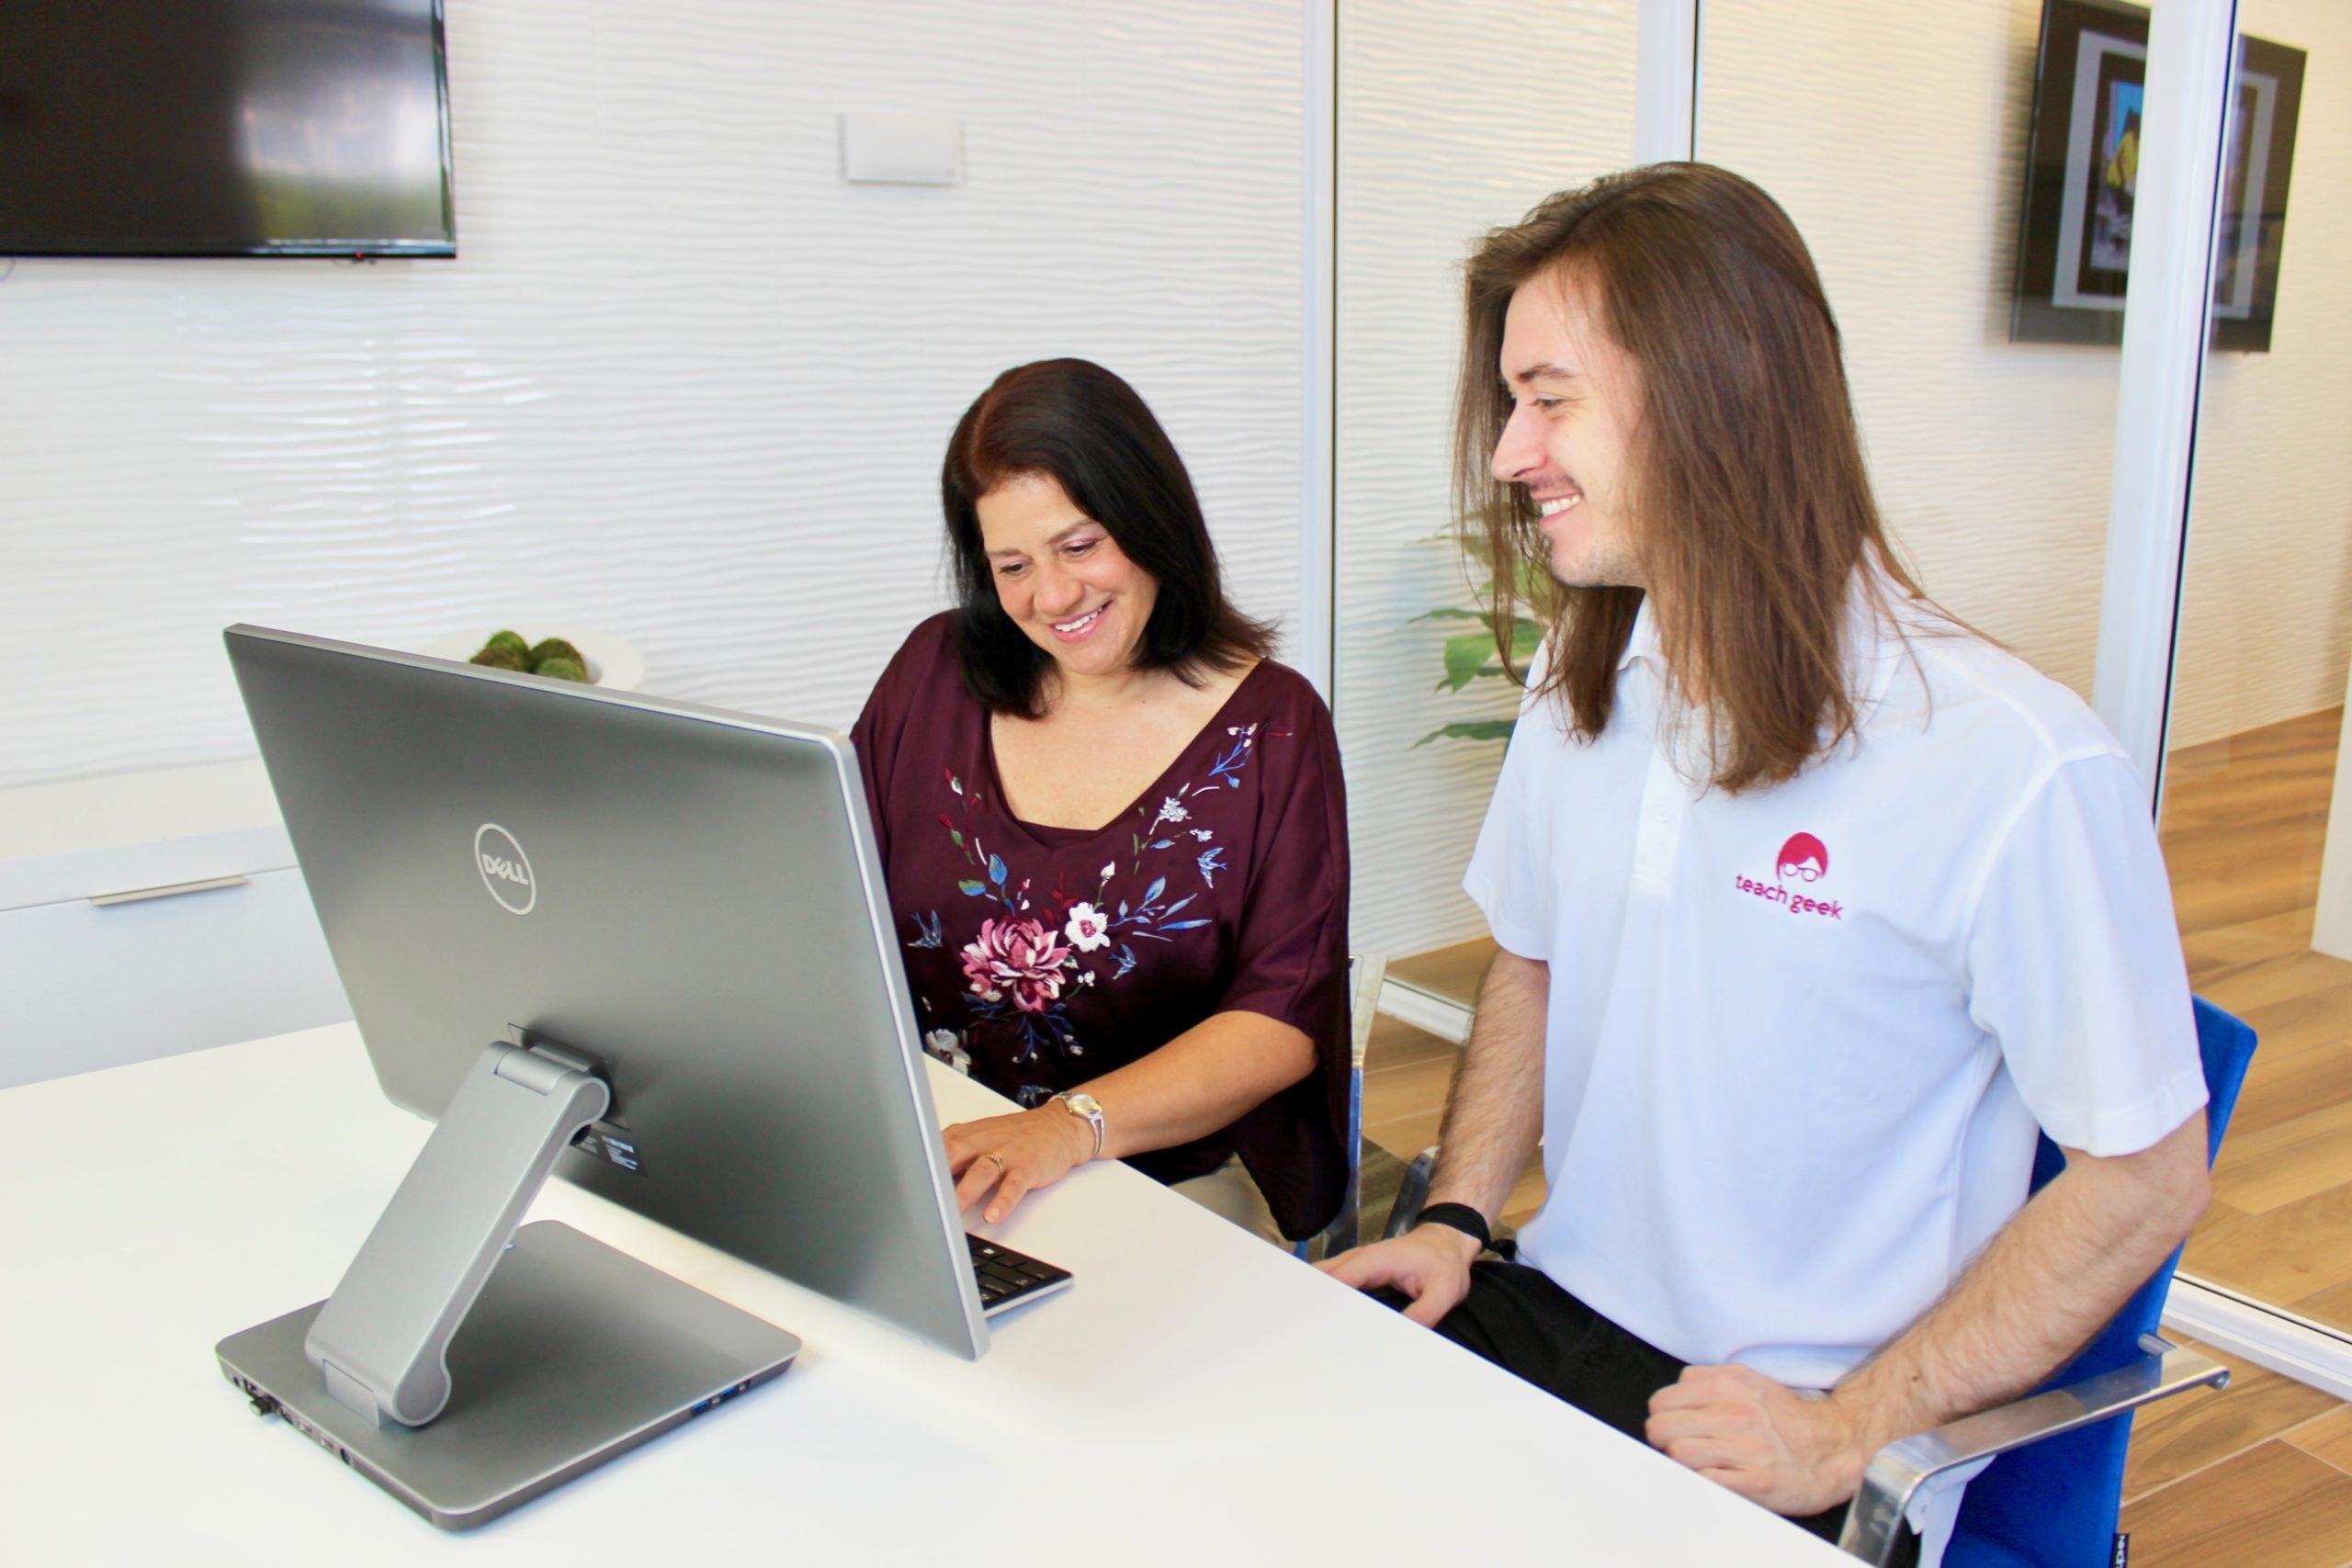 TeachGeek at work with clients